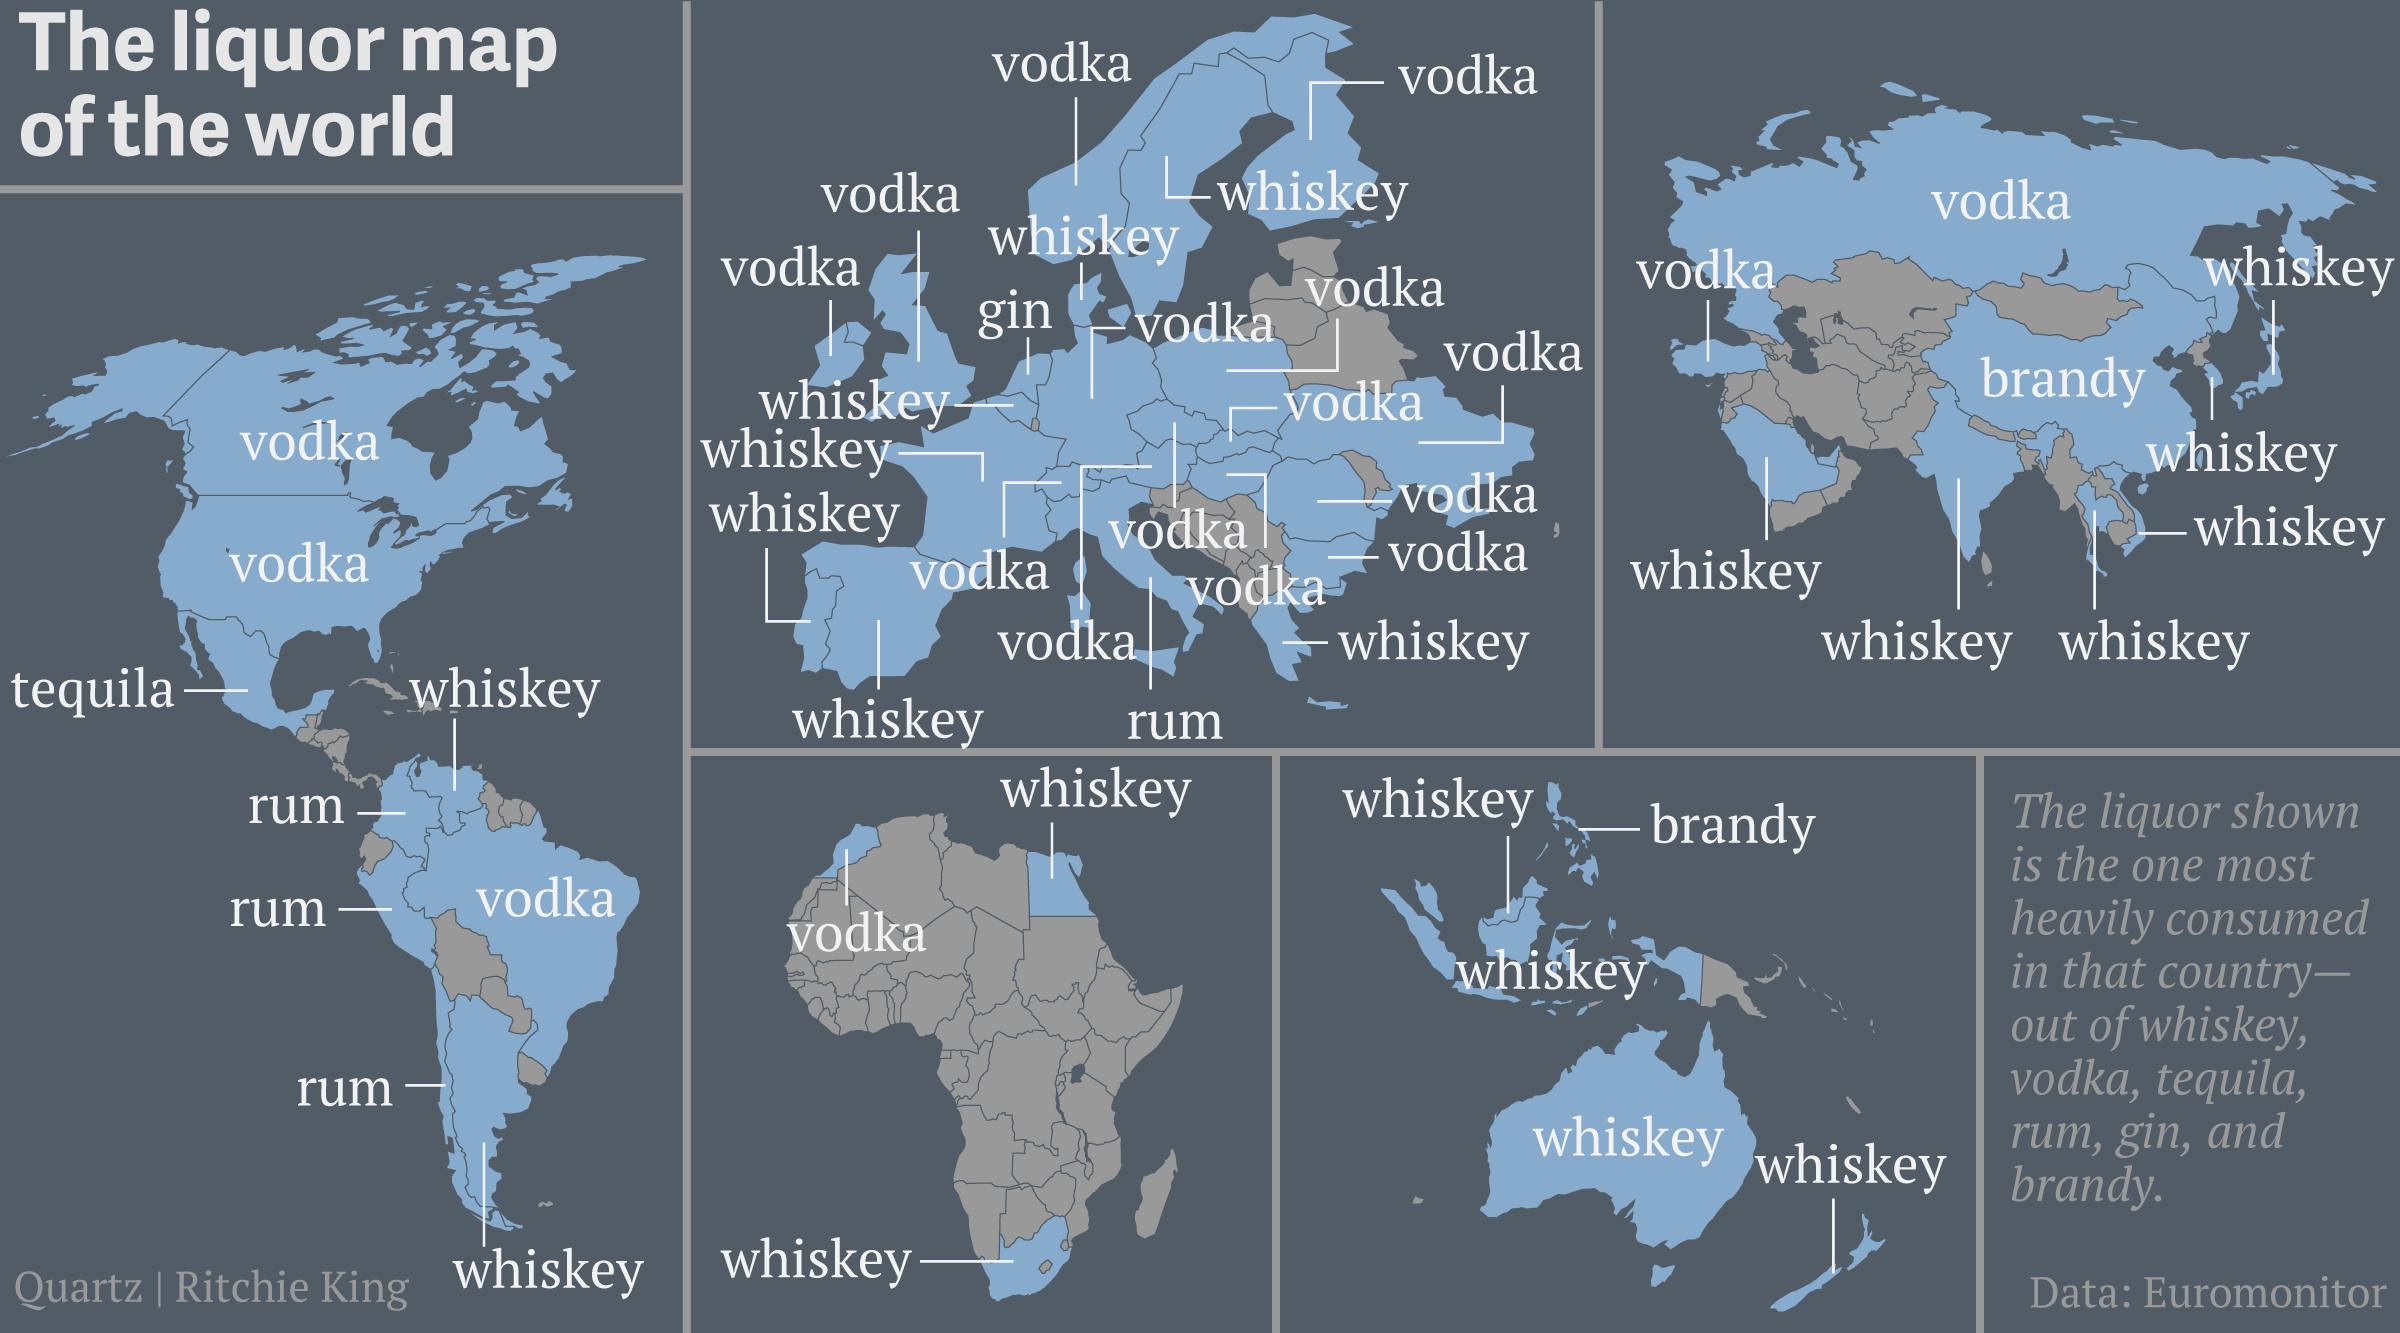 liquor-map2